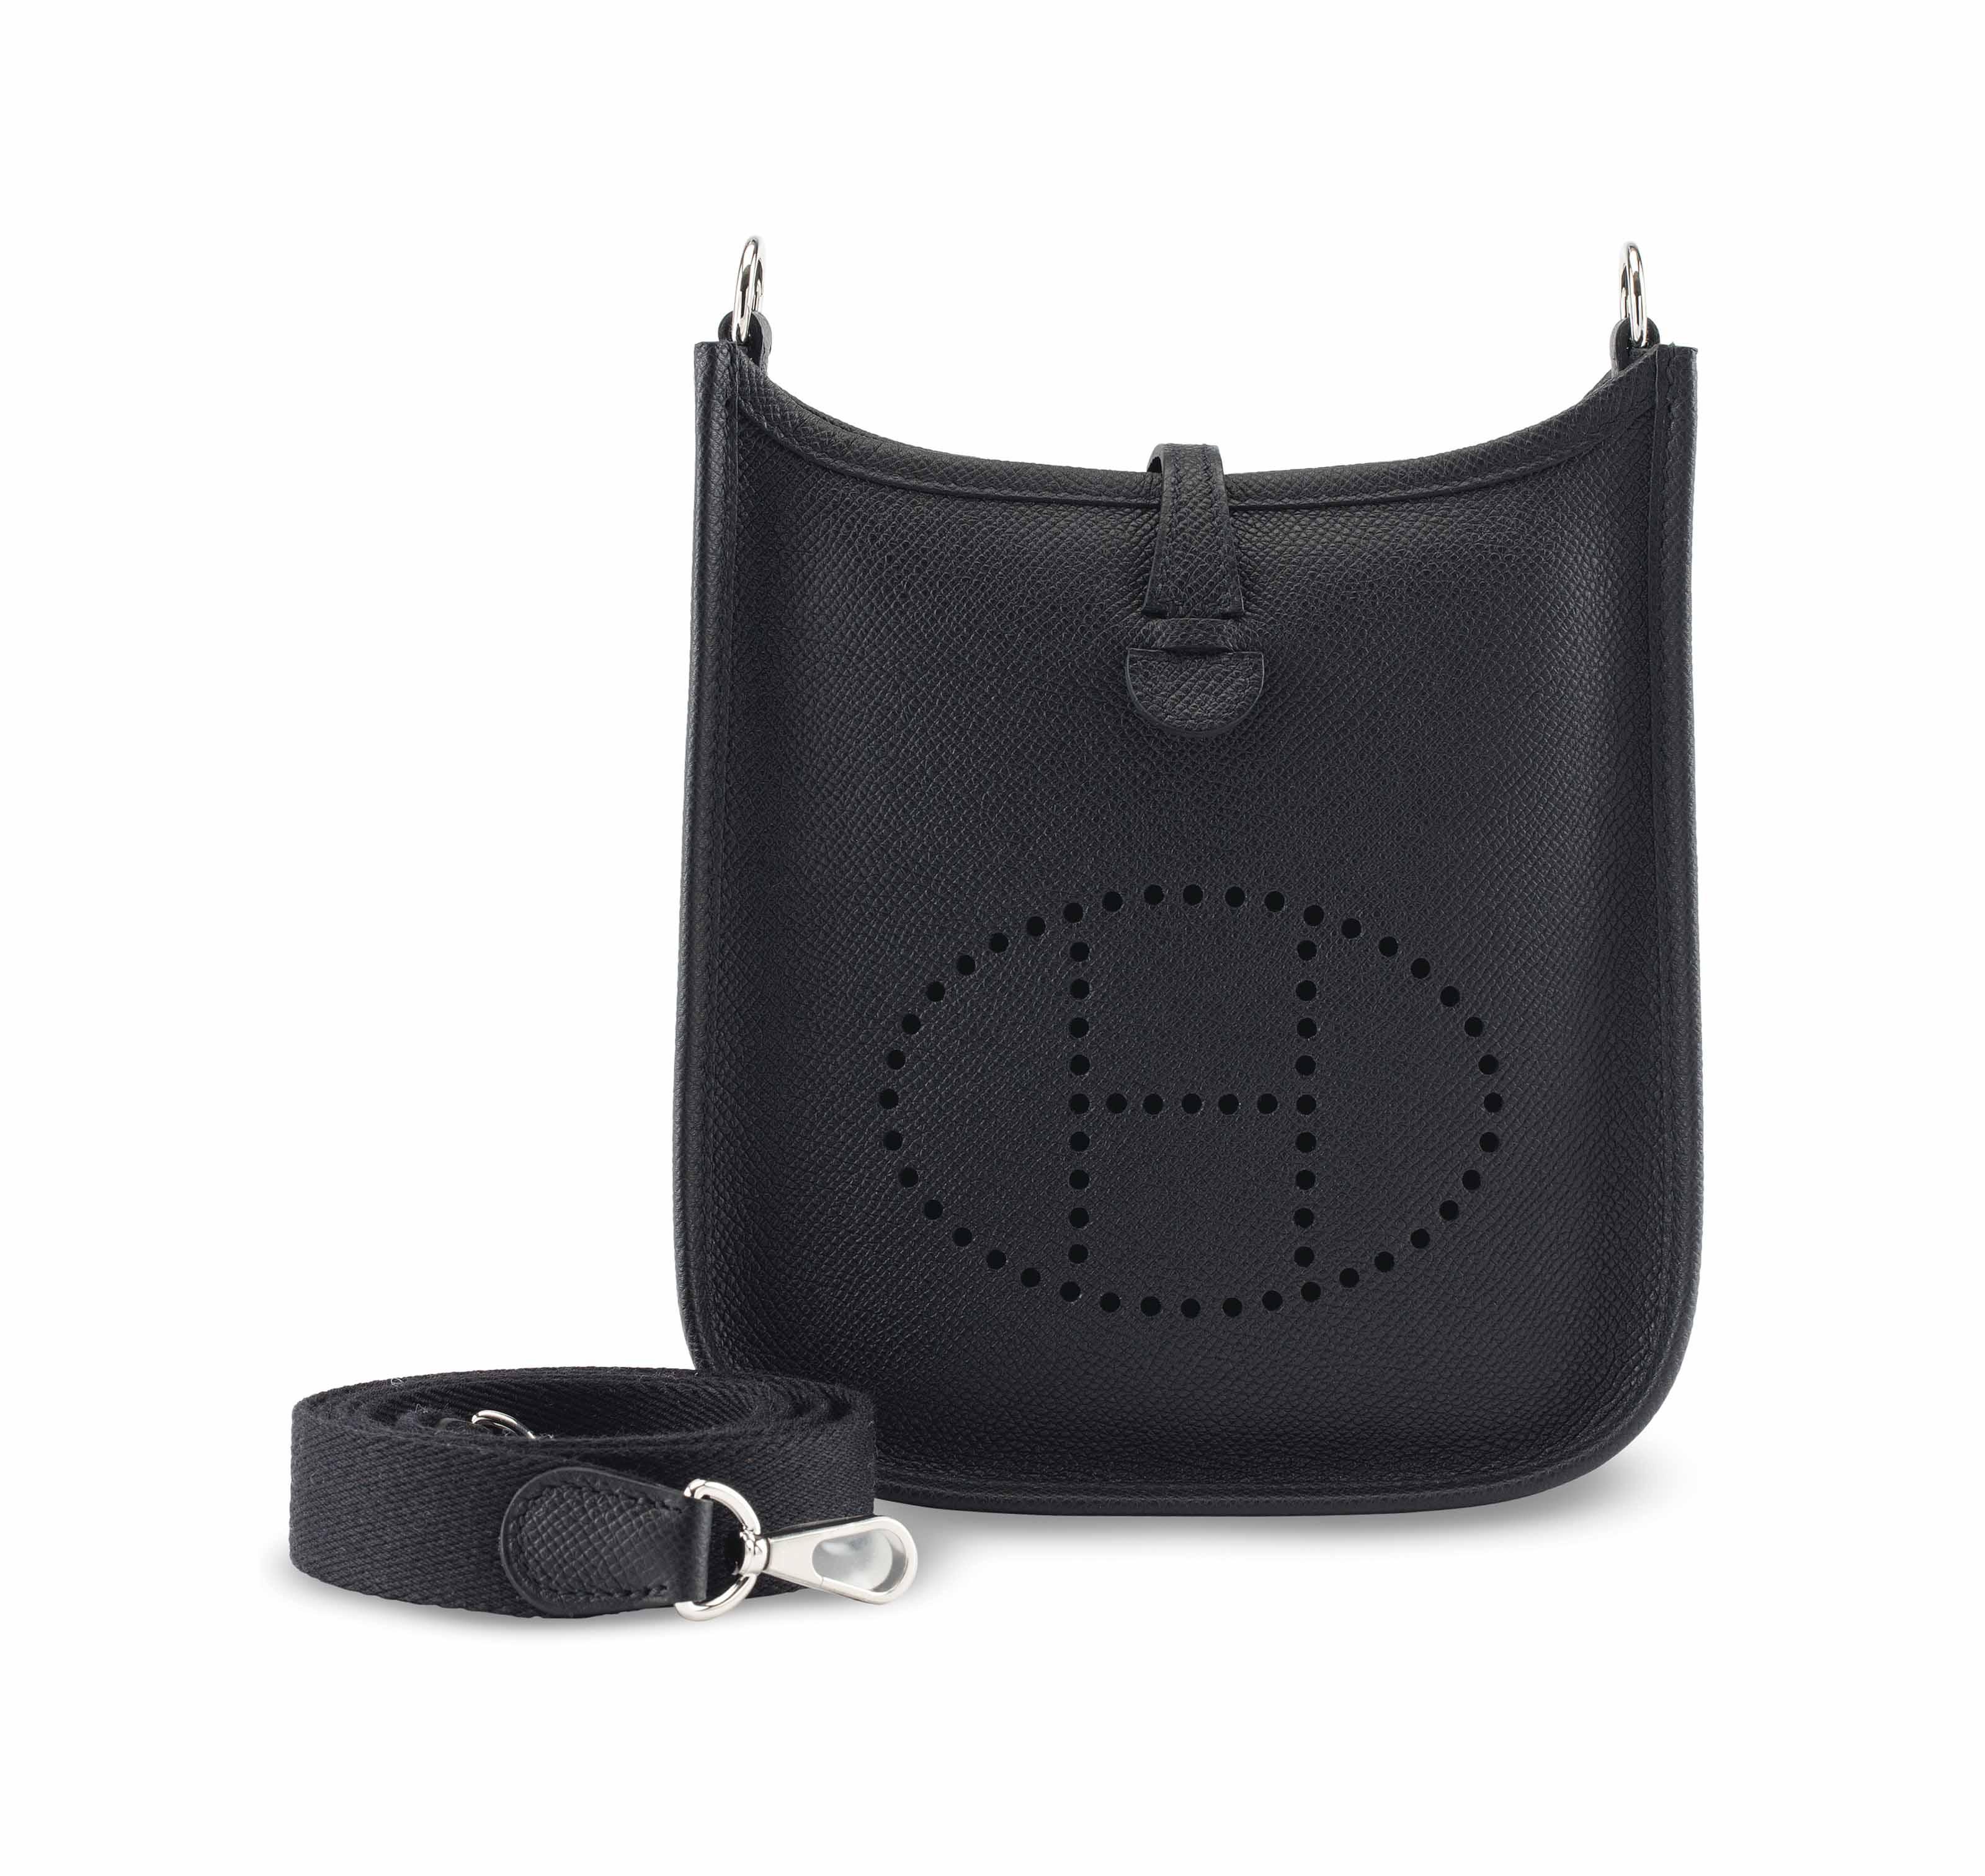 6af130451aca ... purchase a black epsom leather evelyne tpm with palladium hardware.  hermÈs 2016 8f0bb 940db